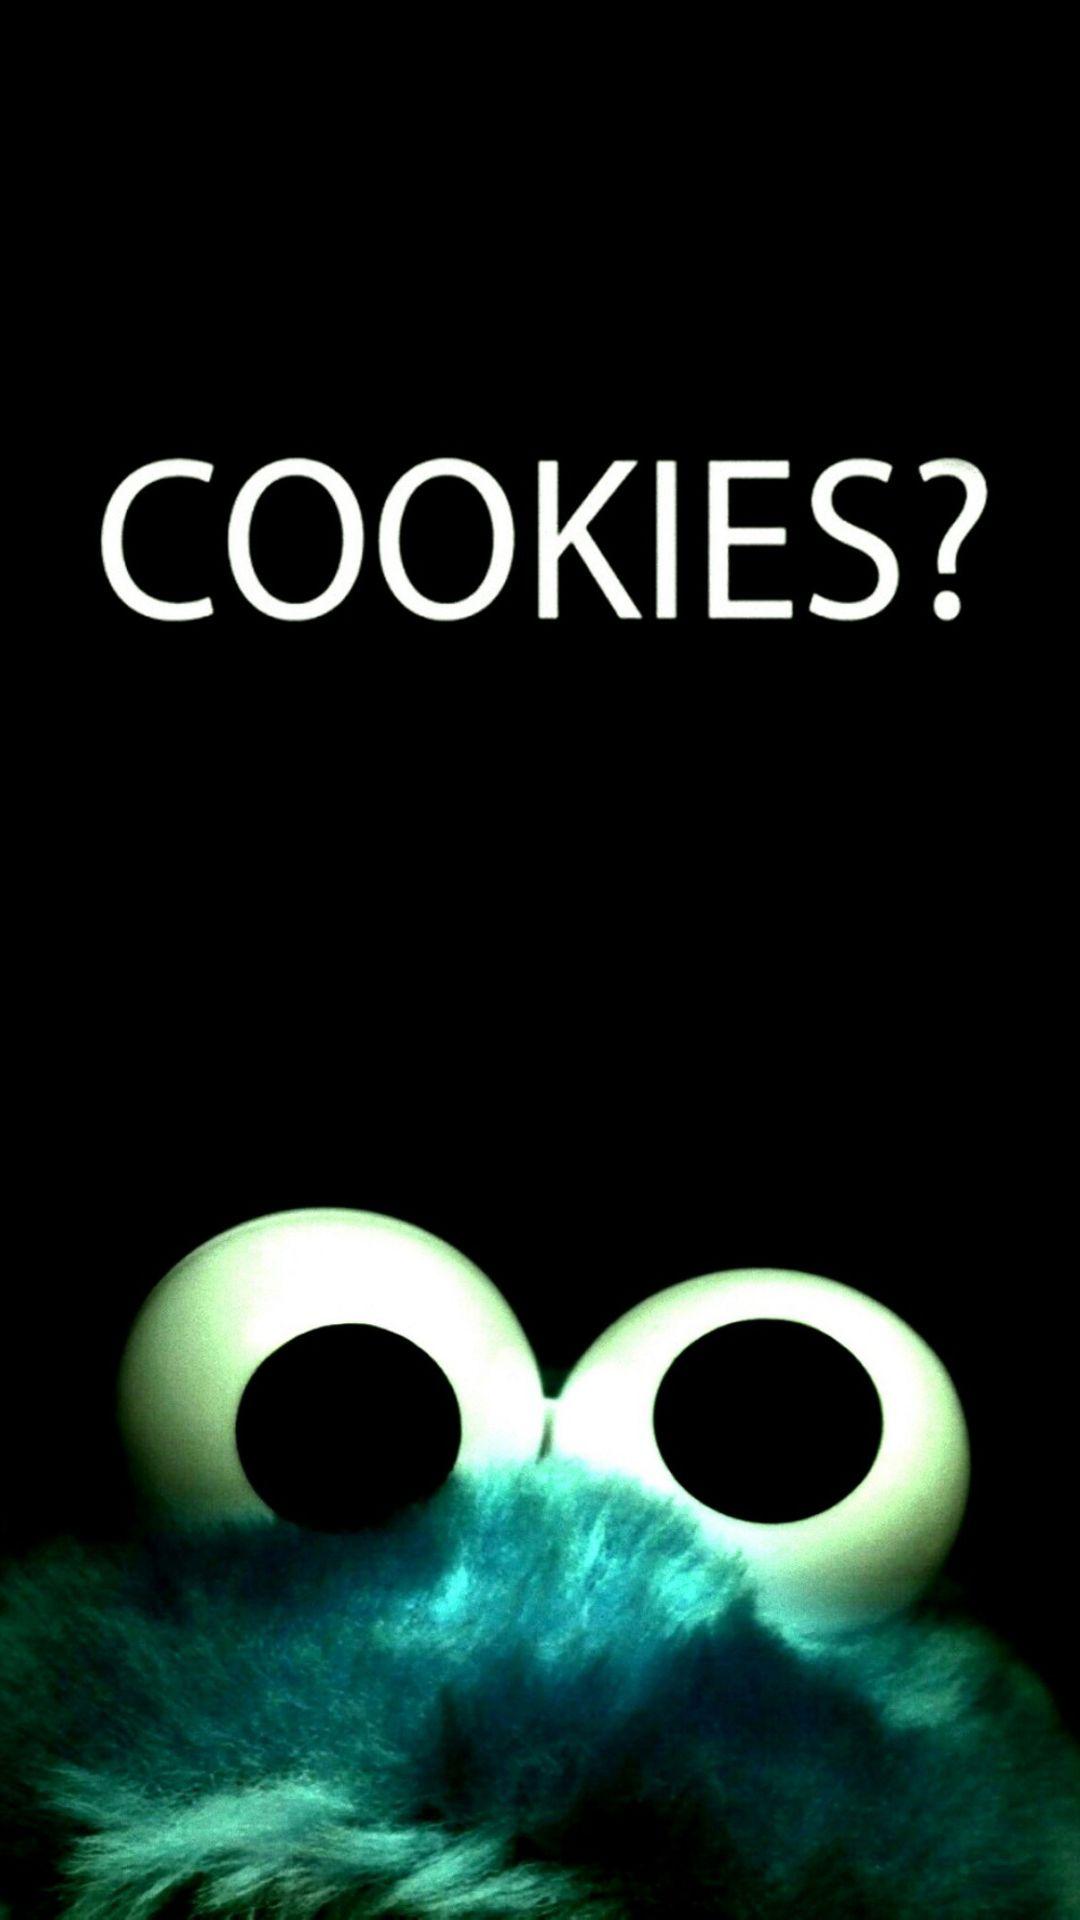 Cookie Monster From Sesame Street Wallpaper Tv Show Wallpapers Funny Lock Screen Wallpaper Screen Savers Wallpapers Funny Lockscreen